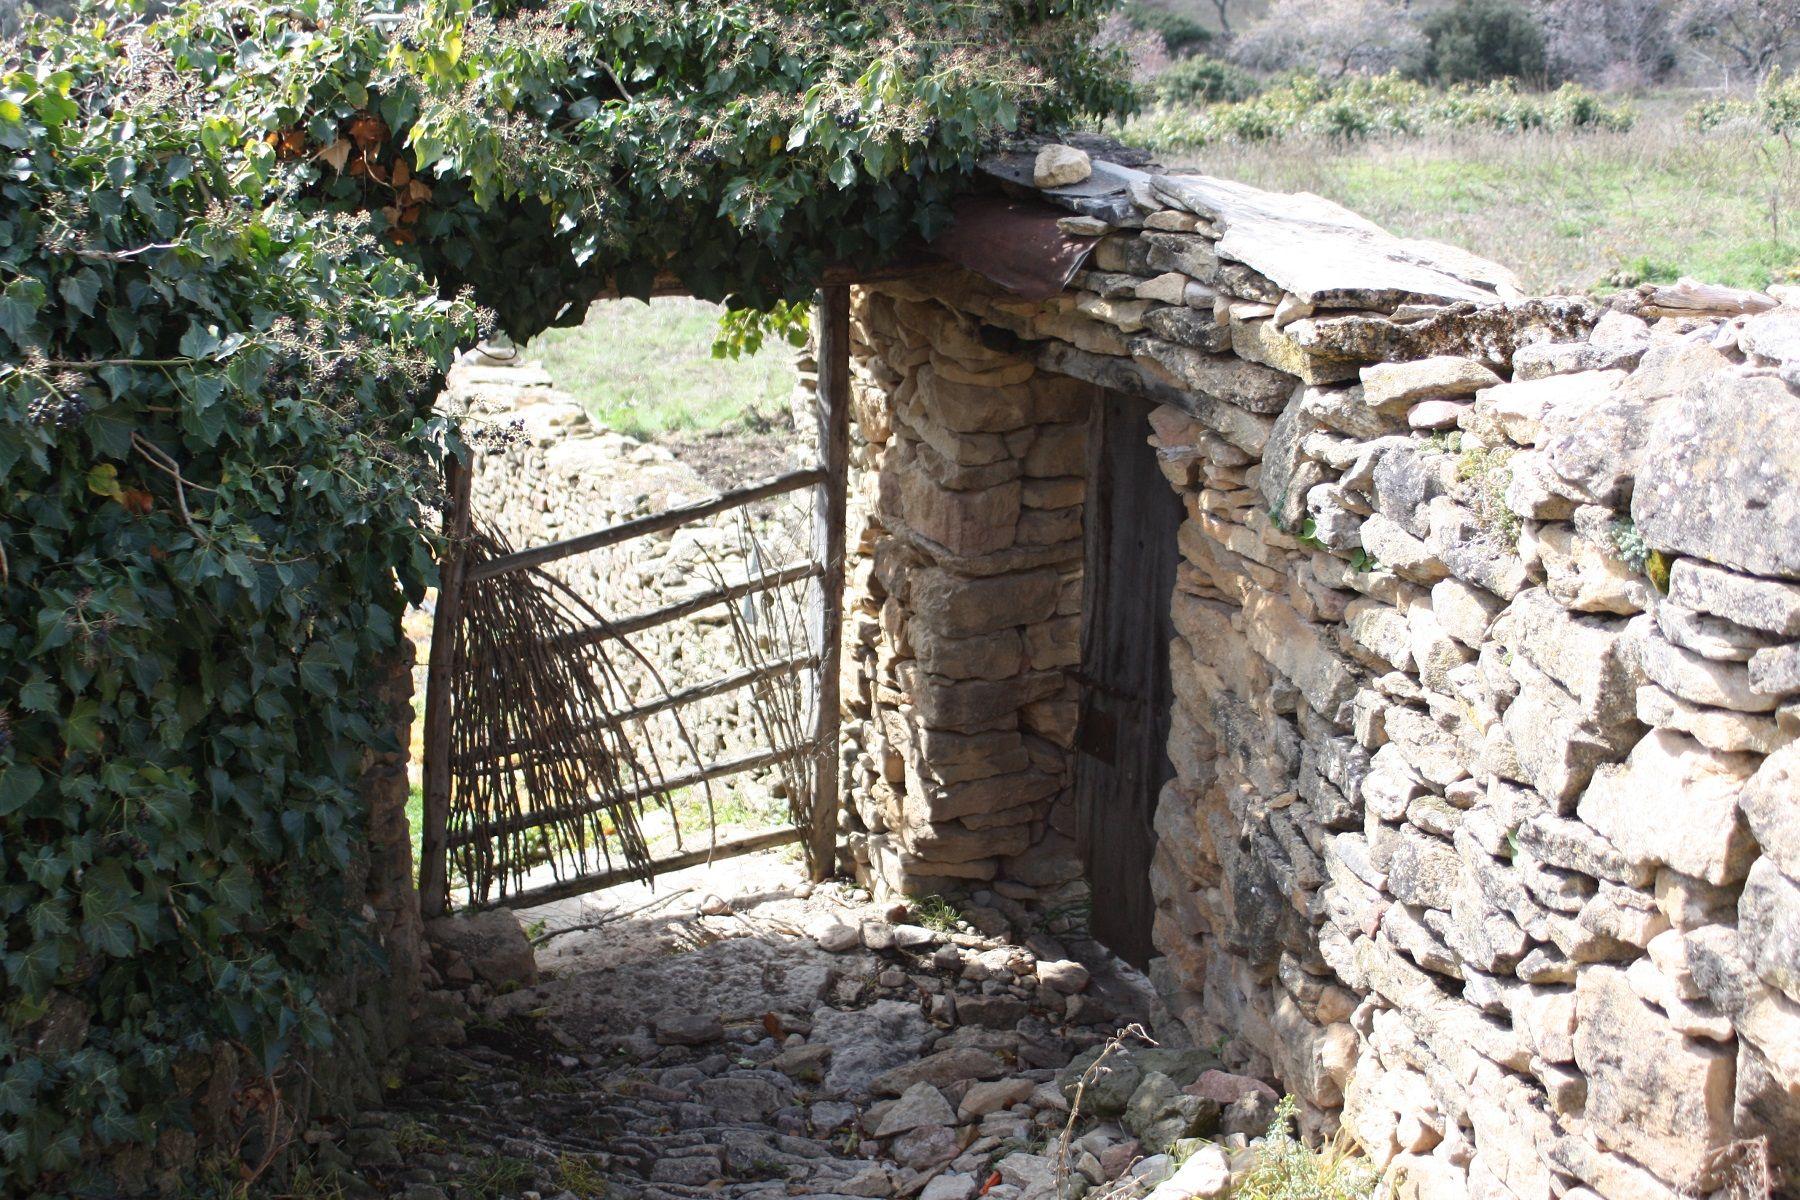 Foto: C. Benítez, archivo de la Comarca de Sobrarbe